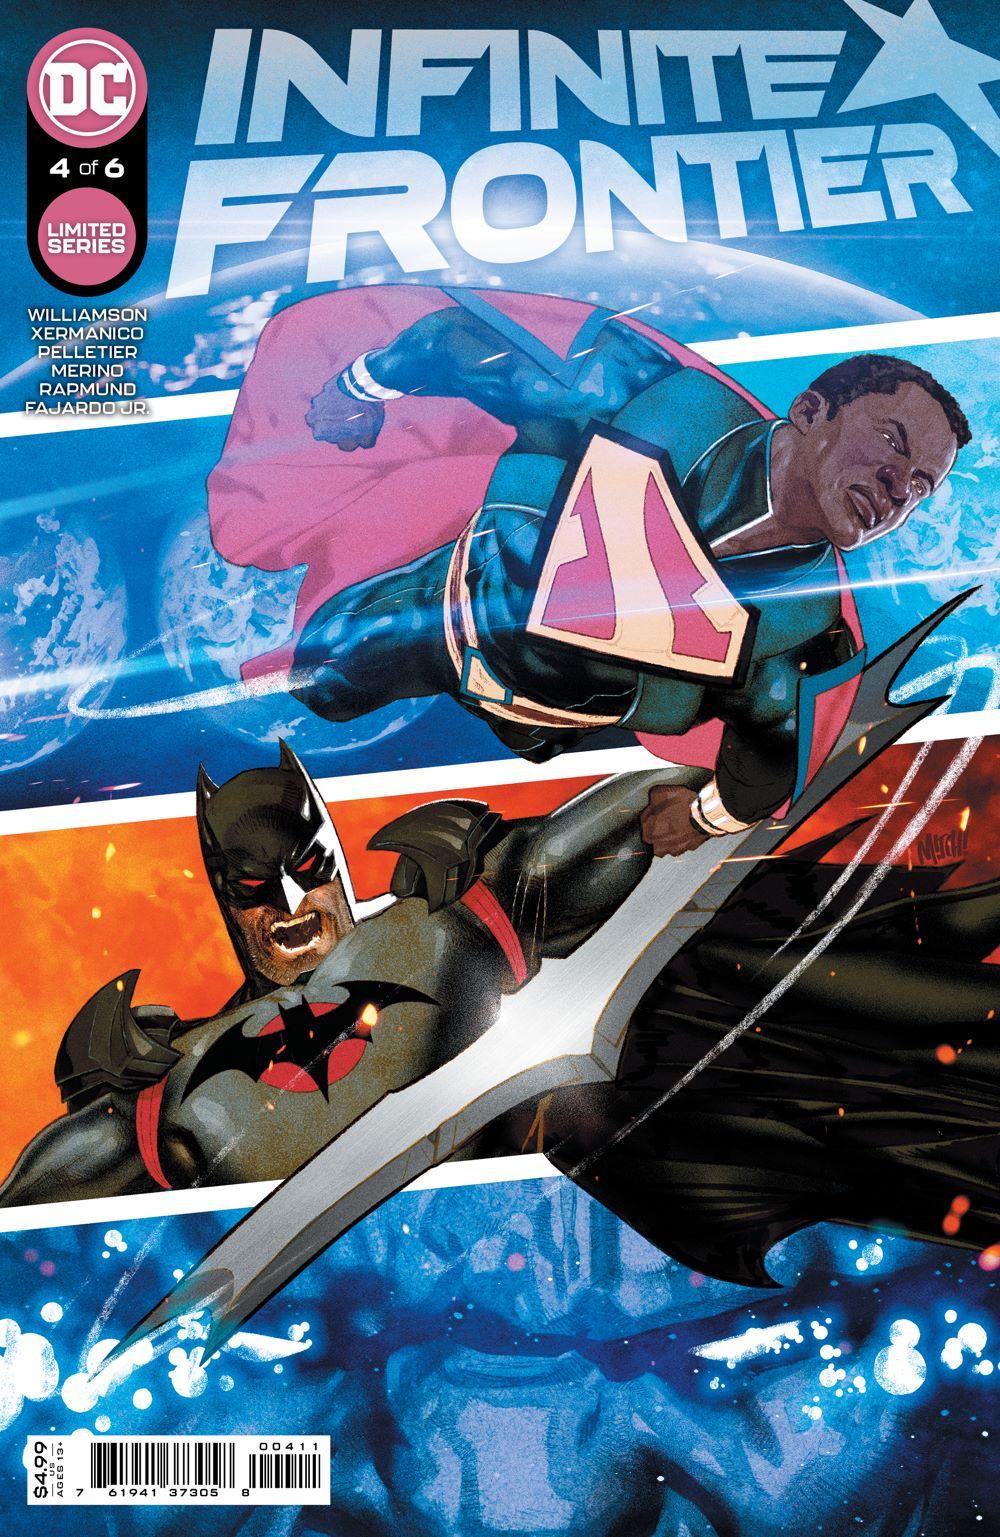 INFINITE_FRONTIER_Cv4 DC Comics August 2021 Solicitations